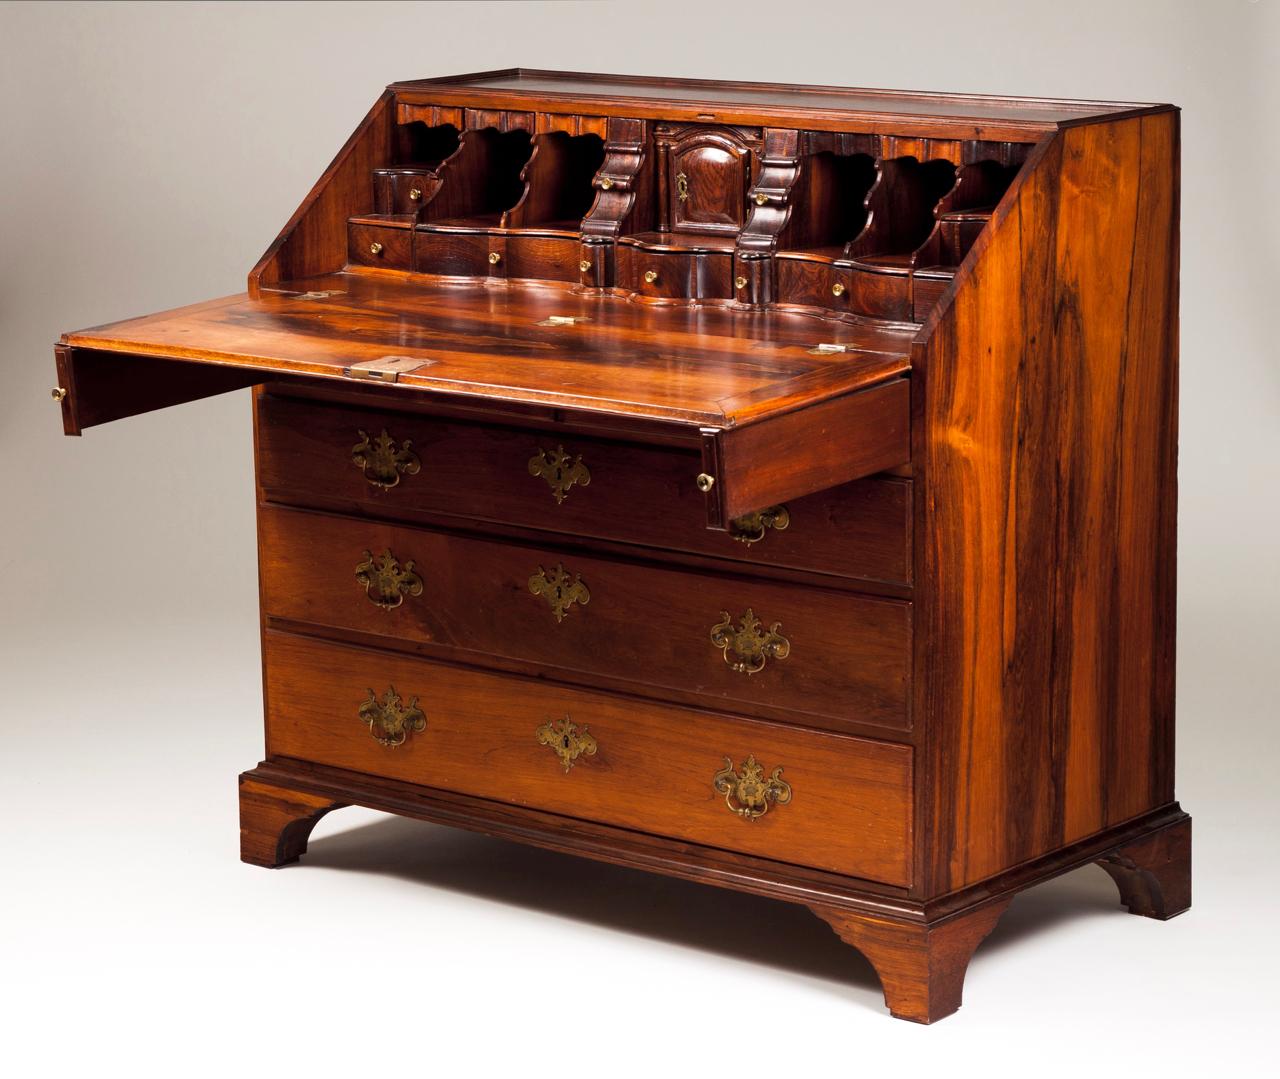 Auction 63 lot 524 a d maria 1777 1816 bureau for Bureau veritas 13